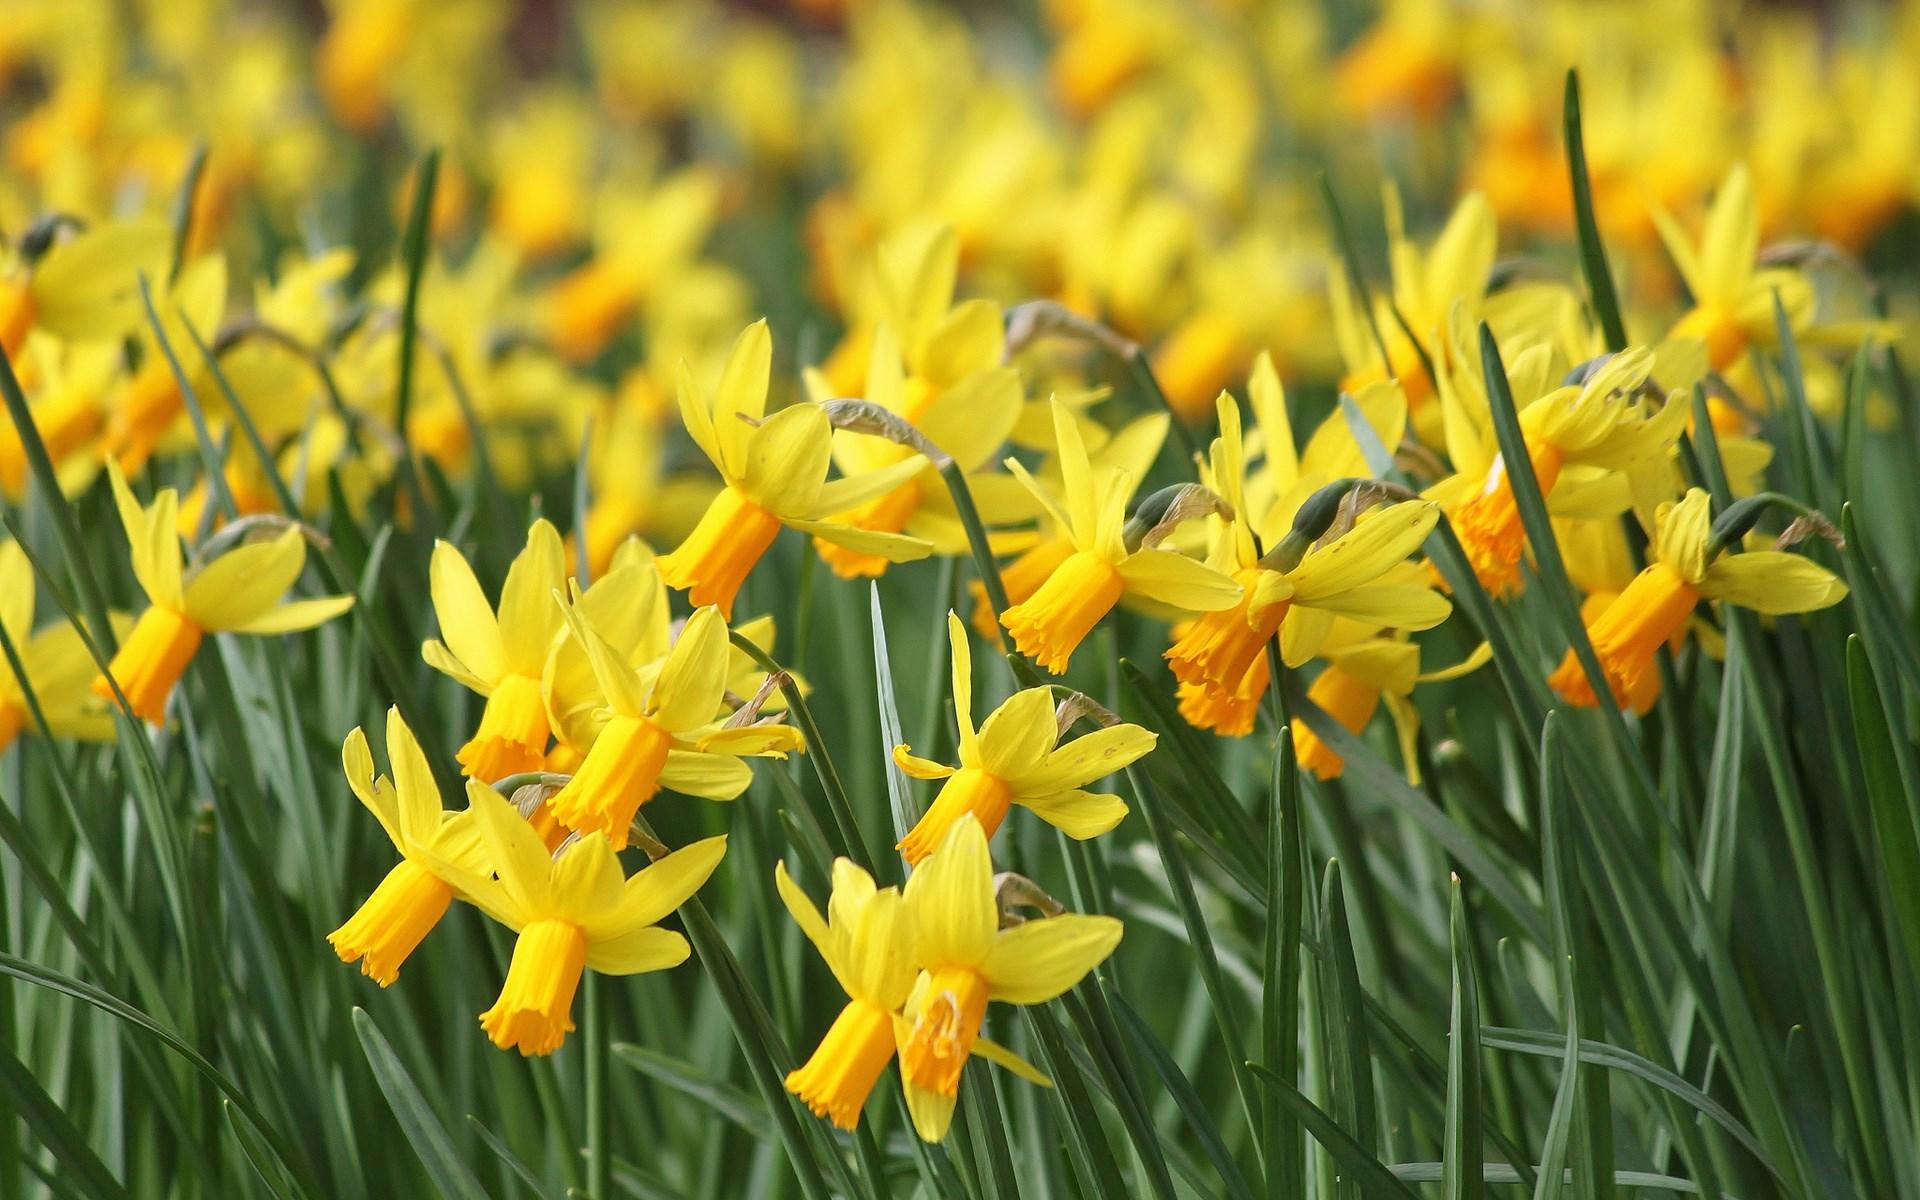 Daffodils Yellow Many Field